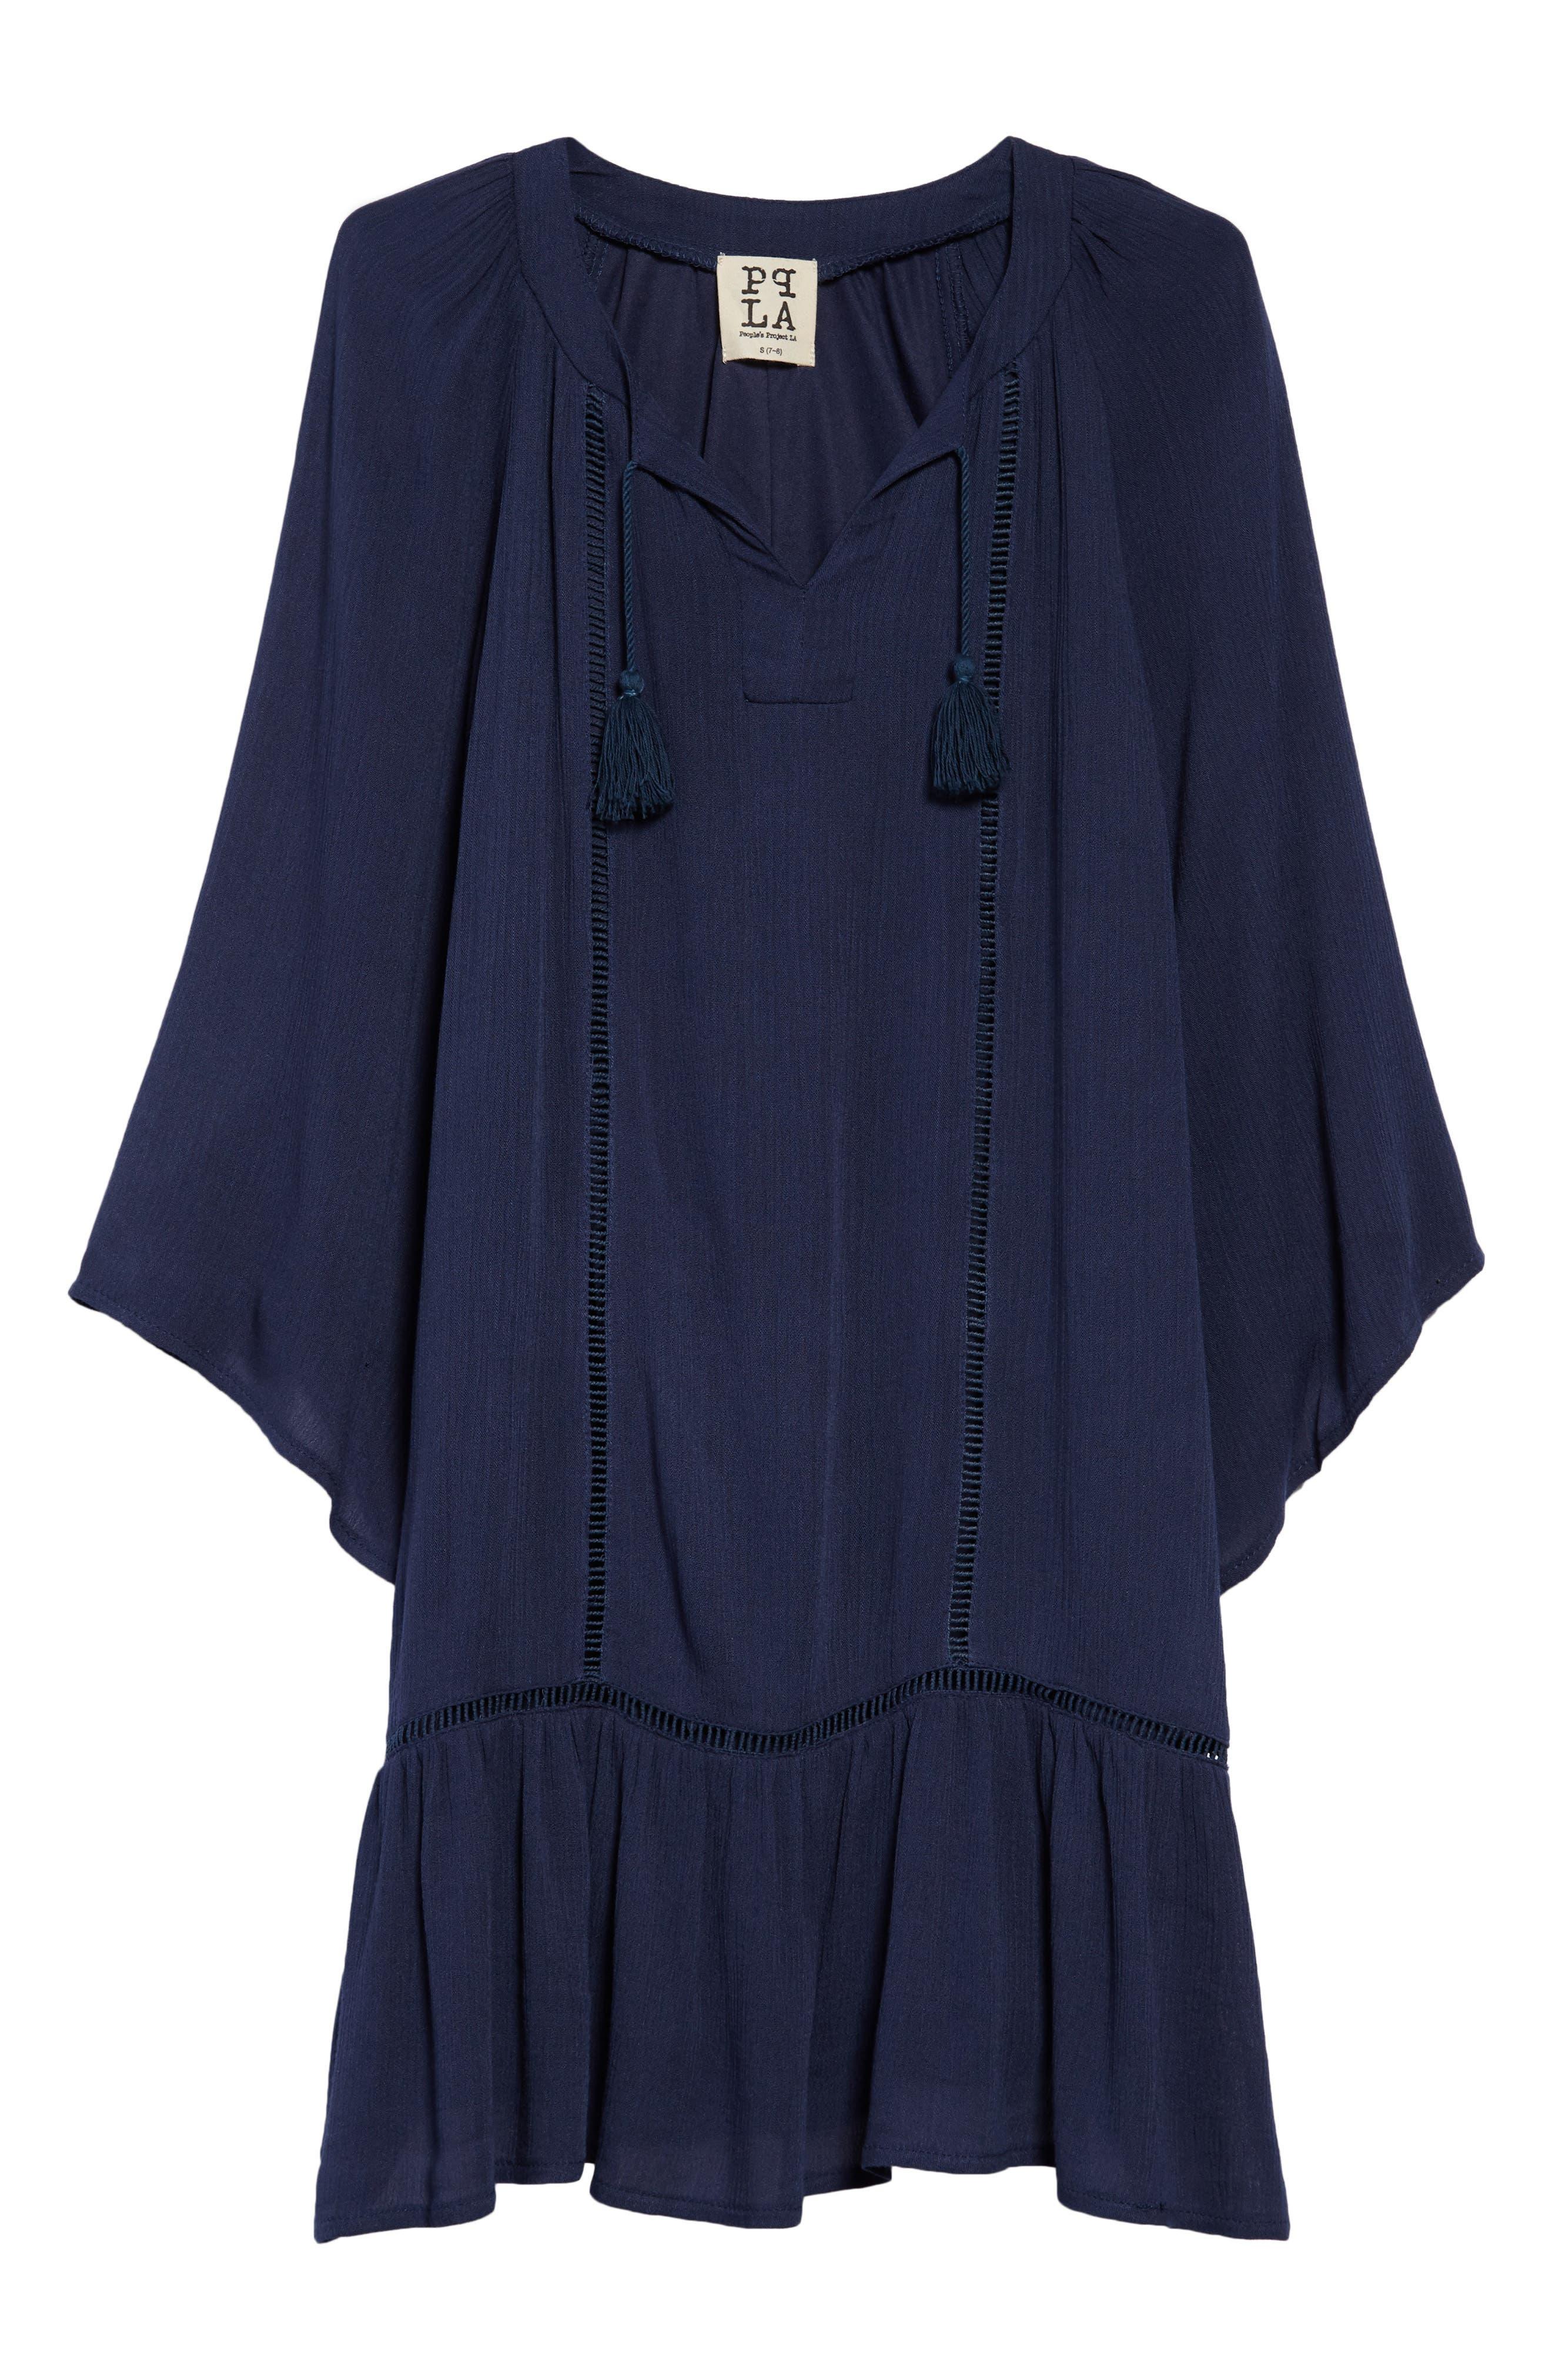 PPLA Vivienne Dress (Big Girls)